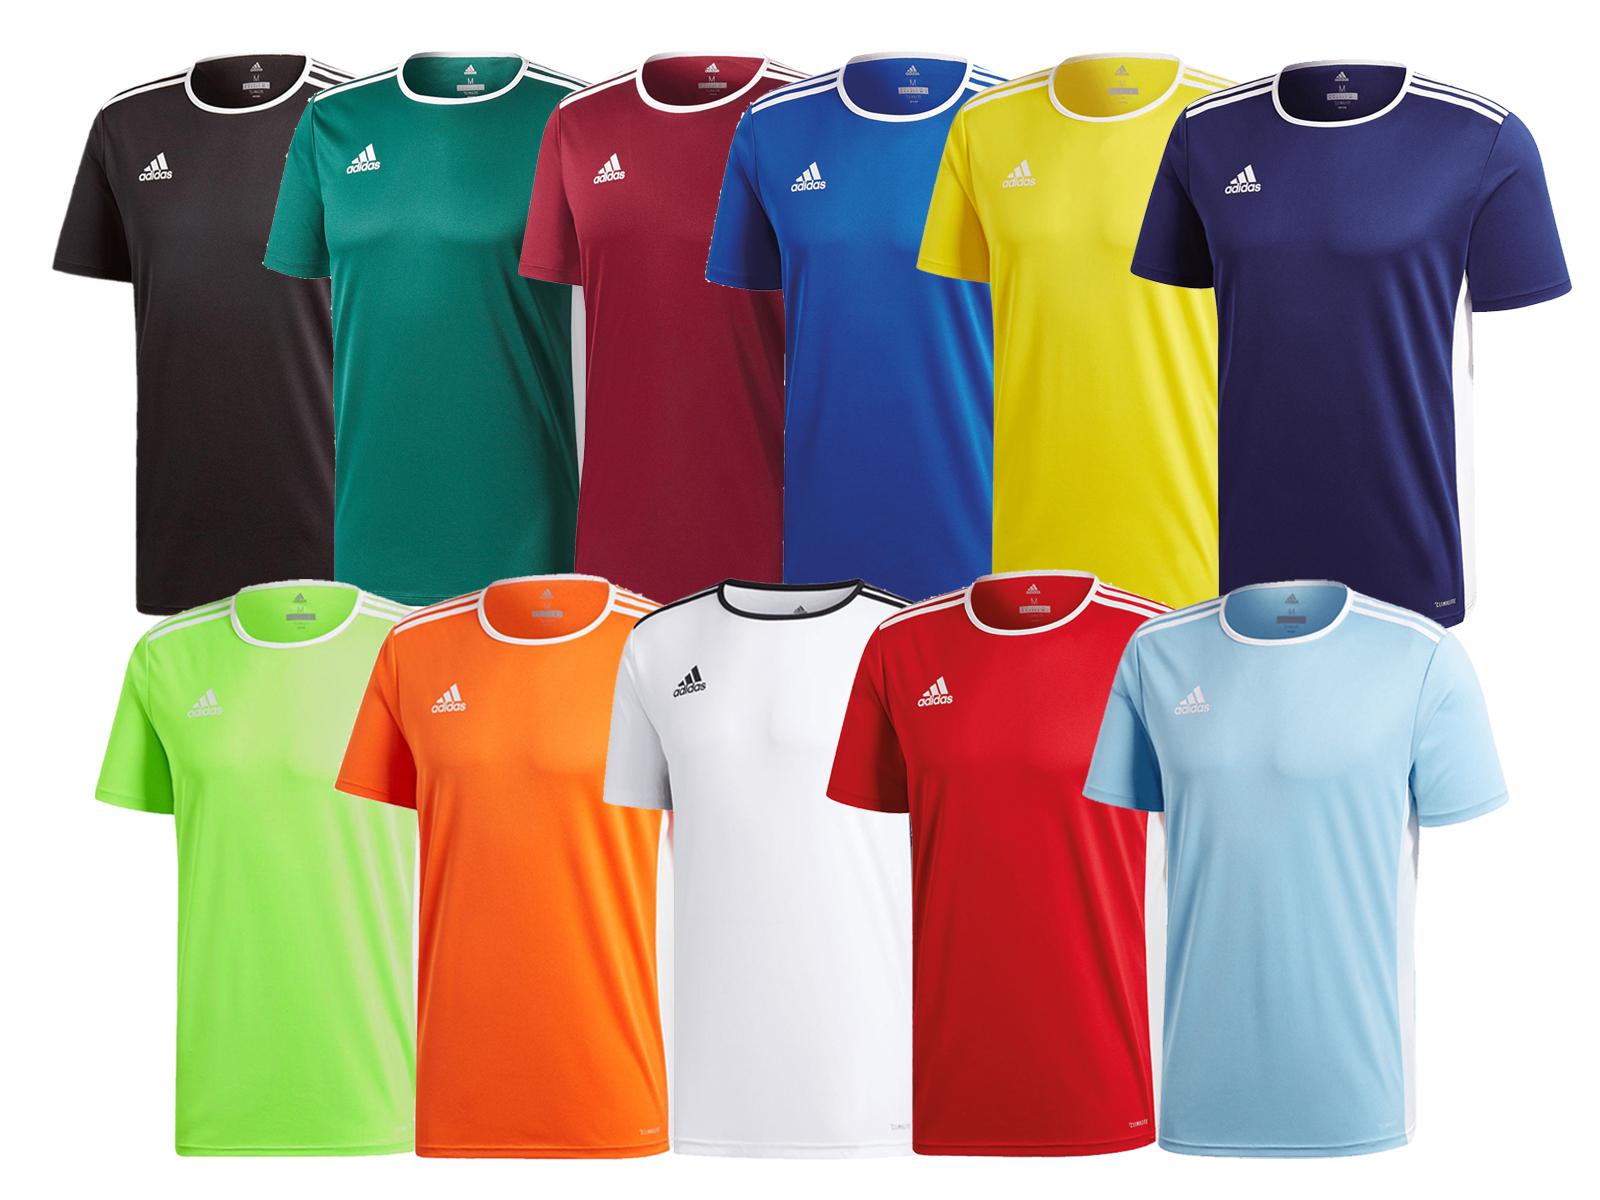 2er Pack adidas Trikots Entrada 18 --> in 11 Farben